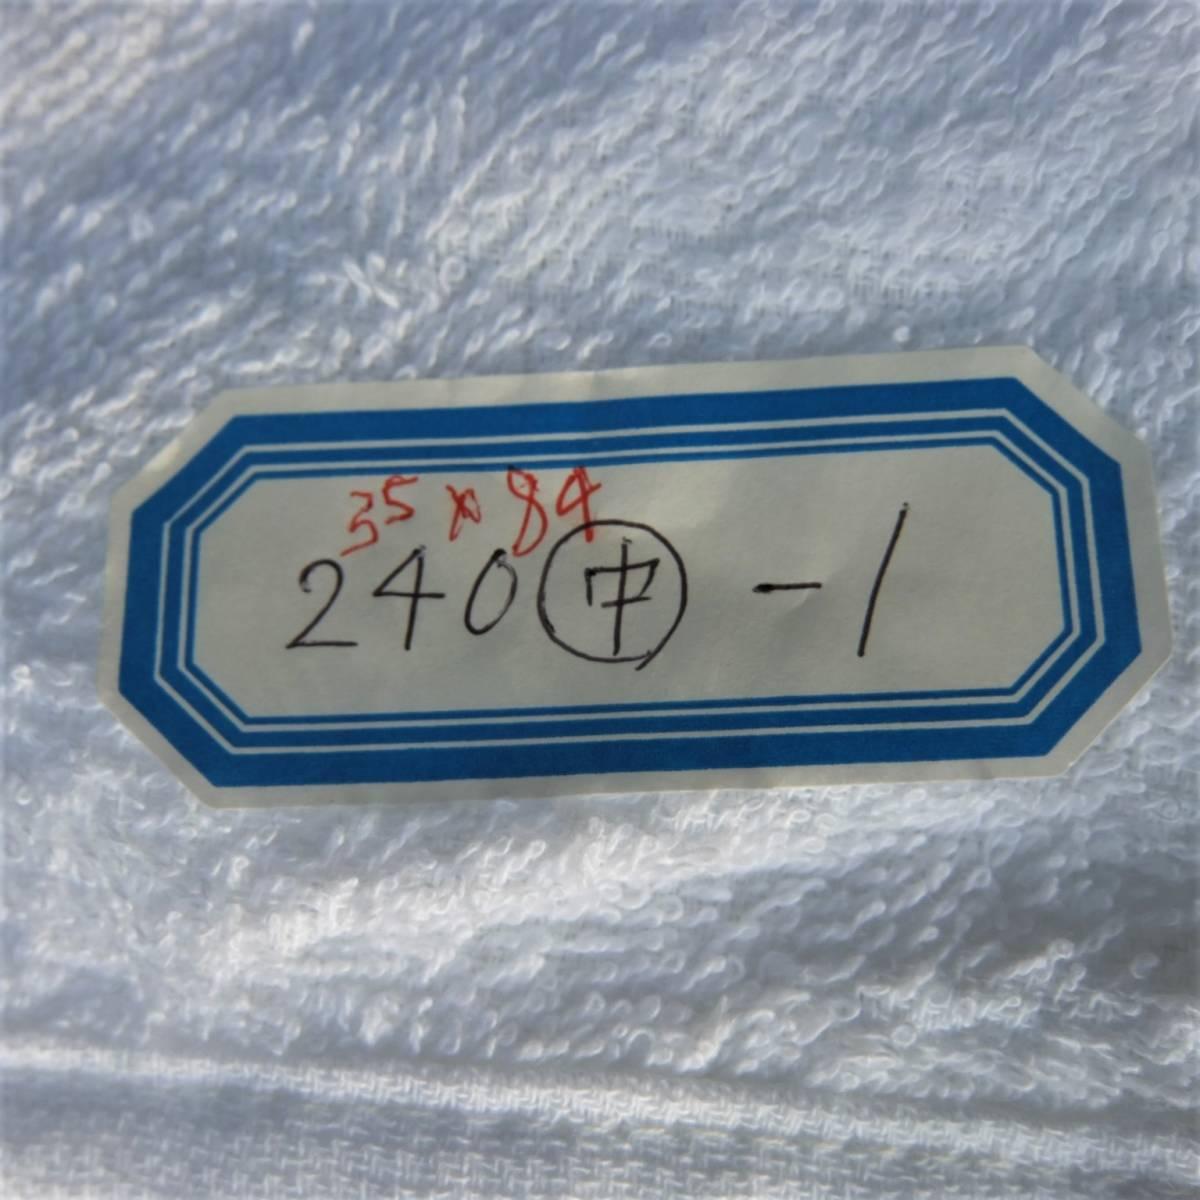 T-016H まとめて240枚 輸入品 白タオル フェイスタオル 240匁 G41105-1 総パイル 綿100% 理容 銭湯 介護 雑巾 タオル 白 業務用 新品_画像4